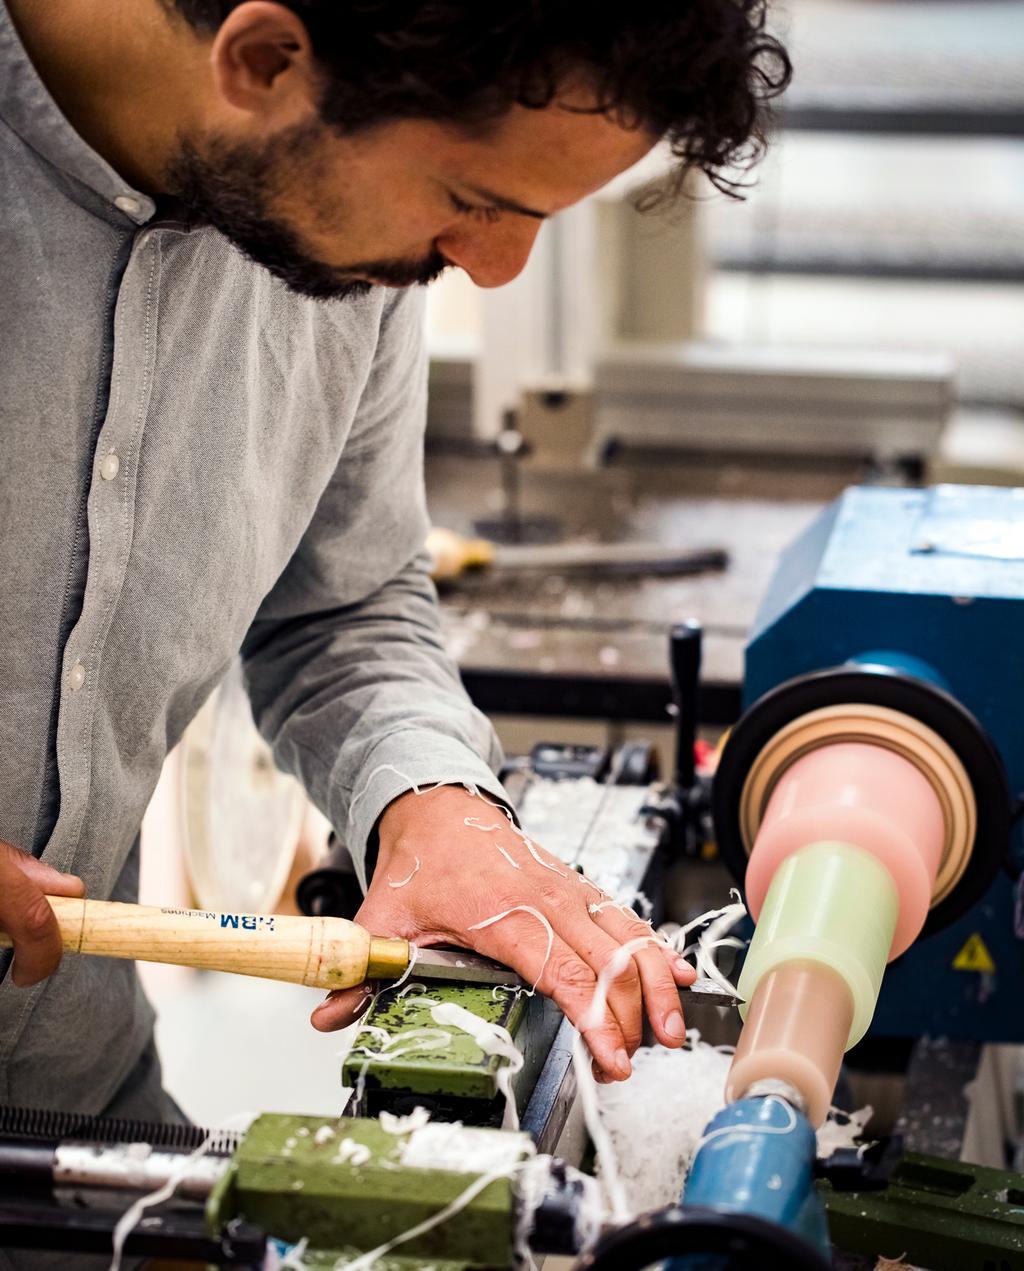 vtwonen 11-2019 | Ambacht Lex Pott atelier werkplaats draaibank